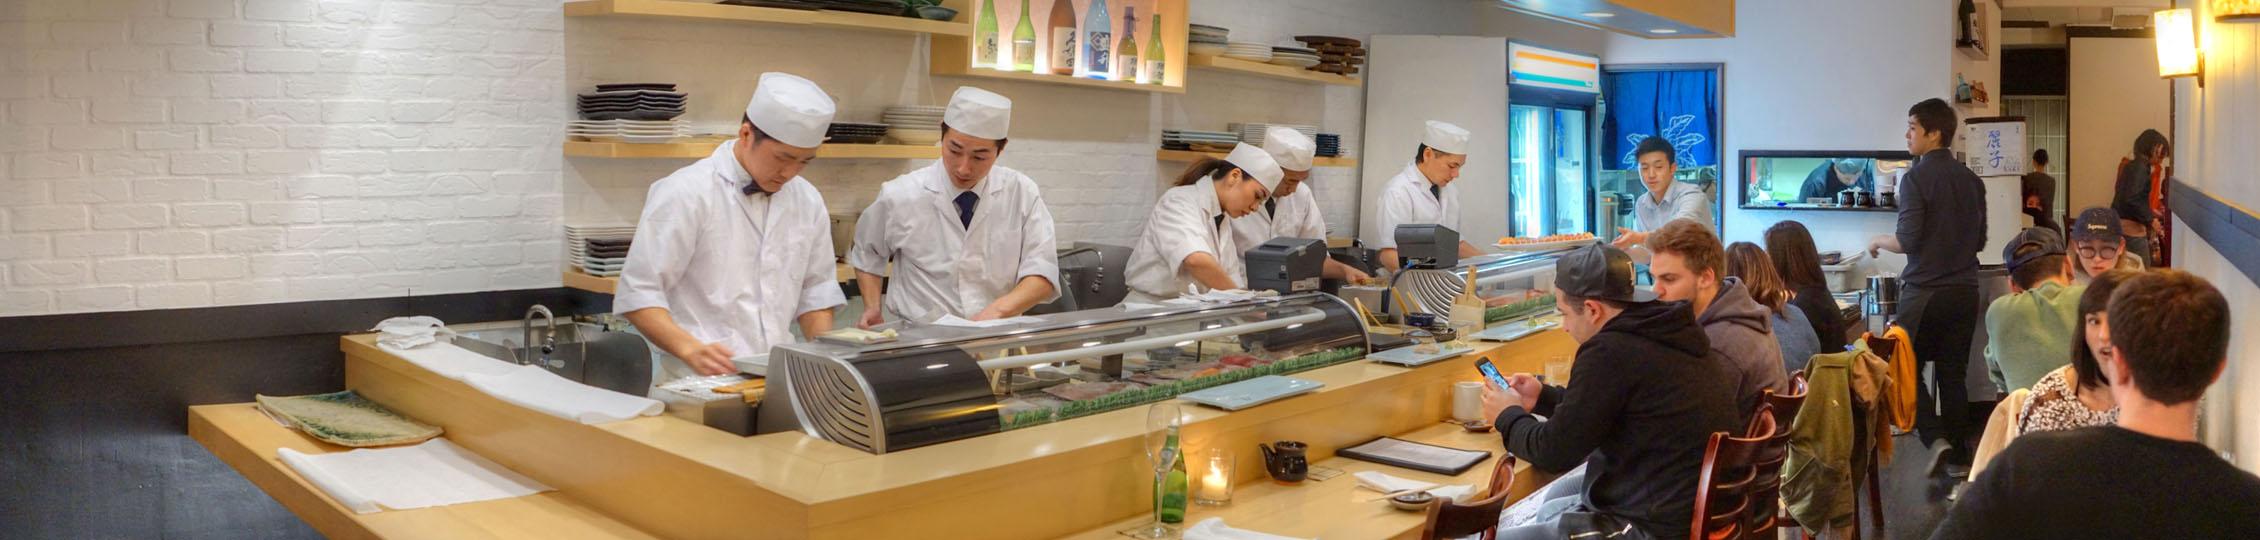 Sushi Enya Interior